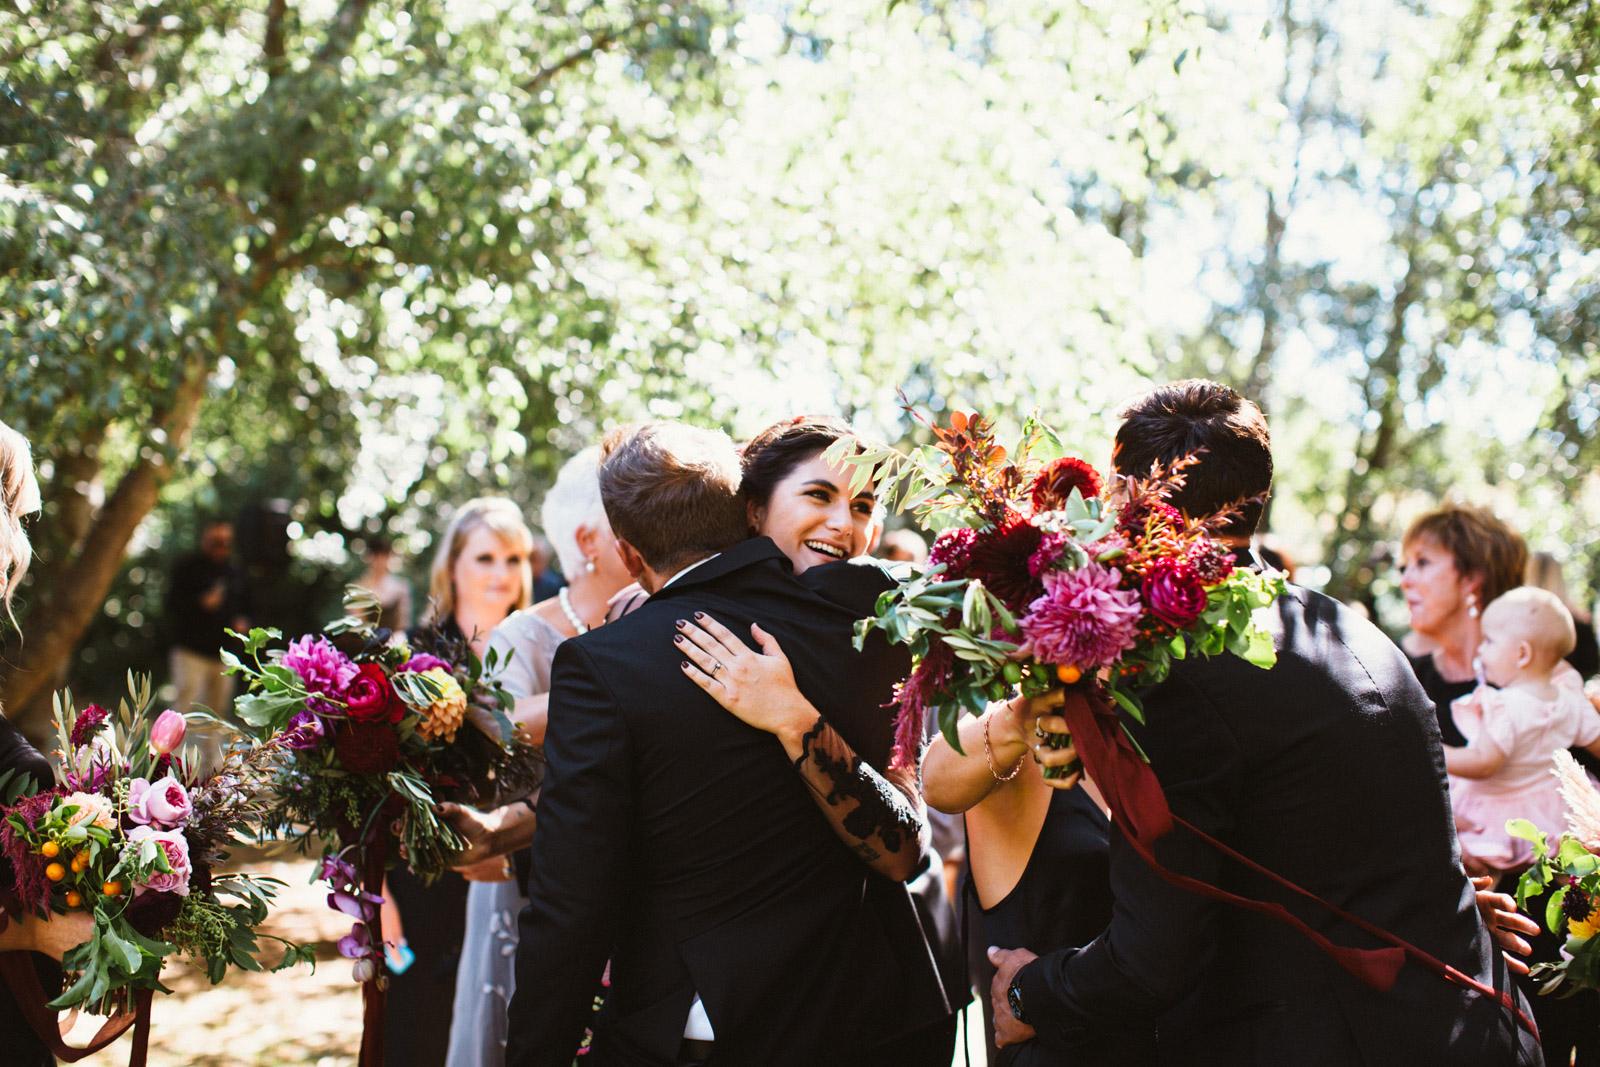 ZD-Melbourne Wedding Photographer-Dean Raphael-51.jpg